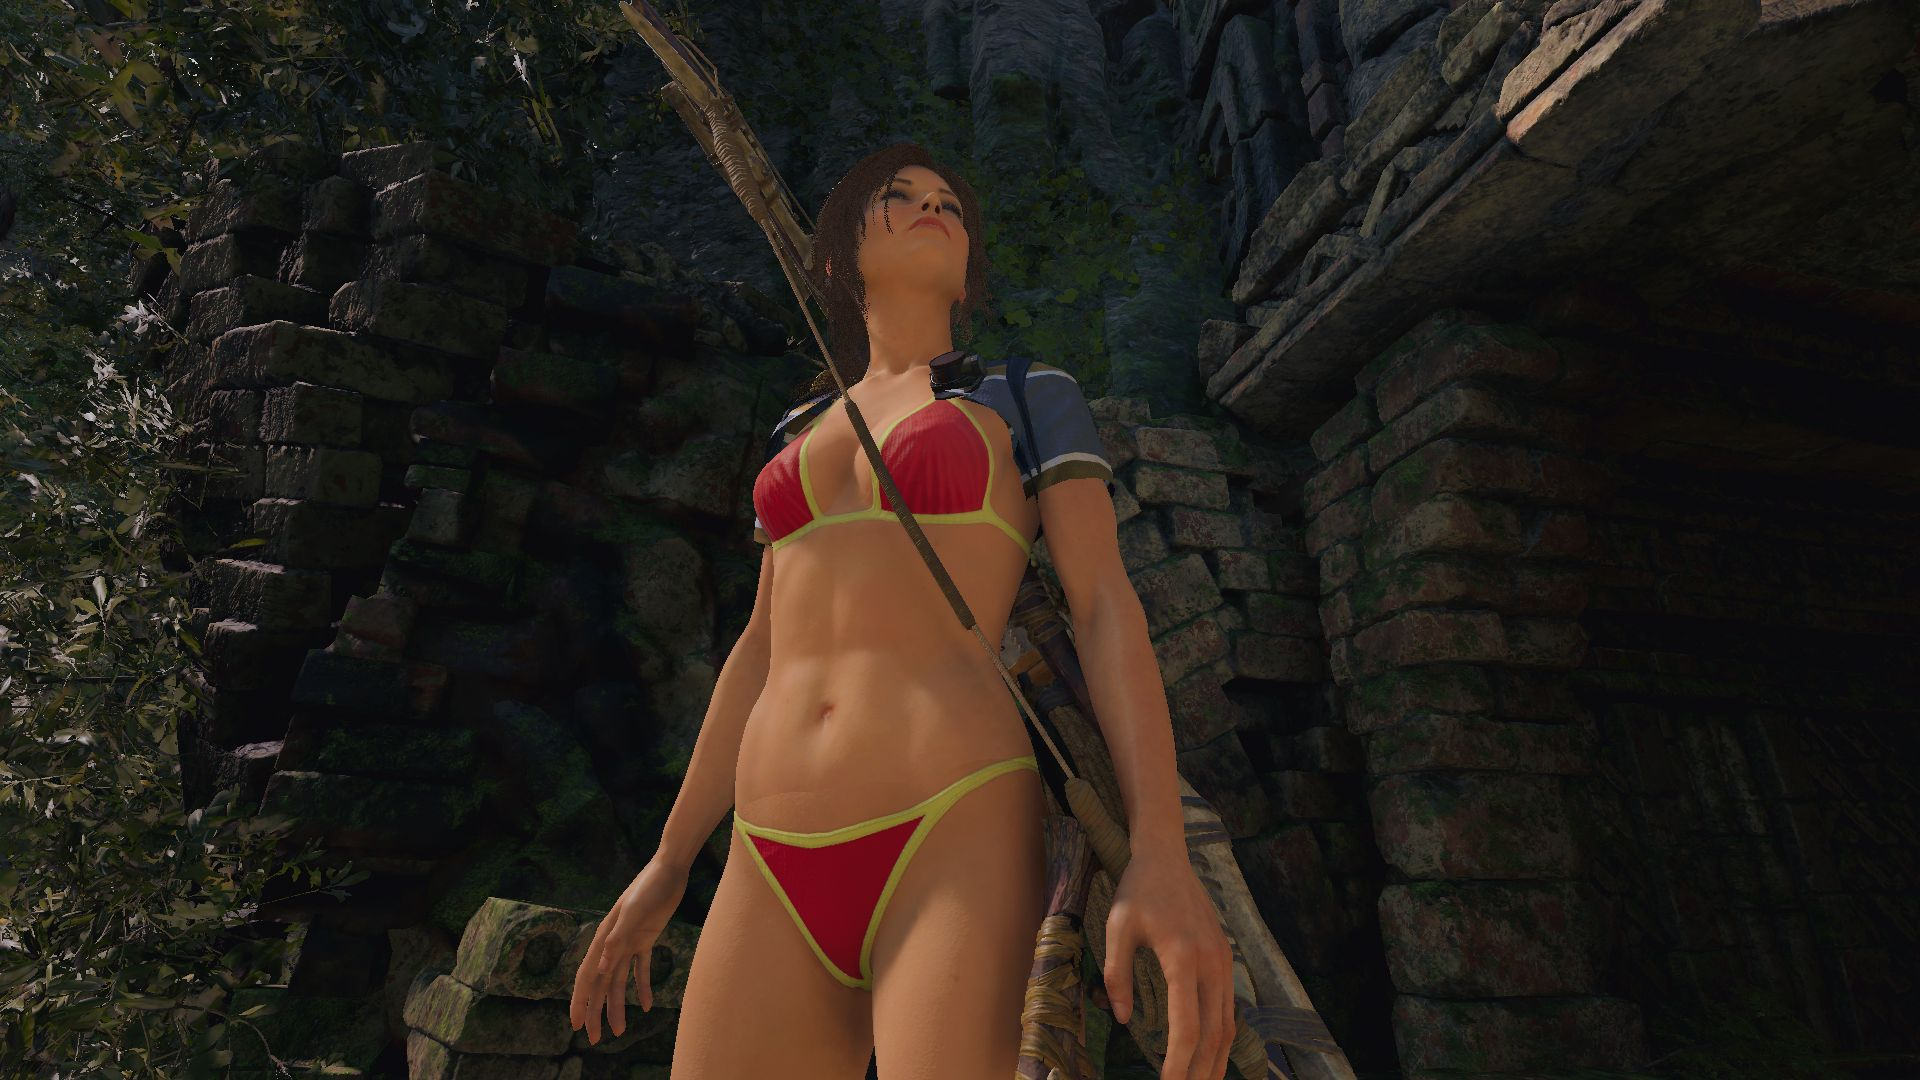 000707.Jpg - Shadow of the Tomb Raider